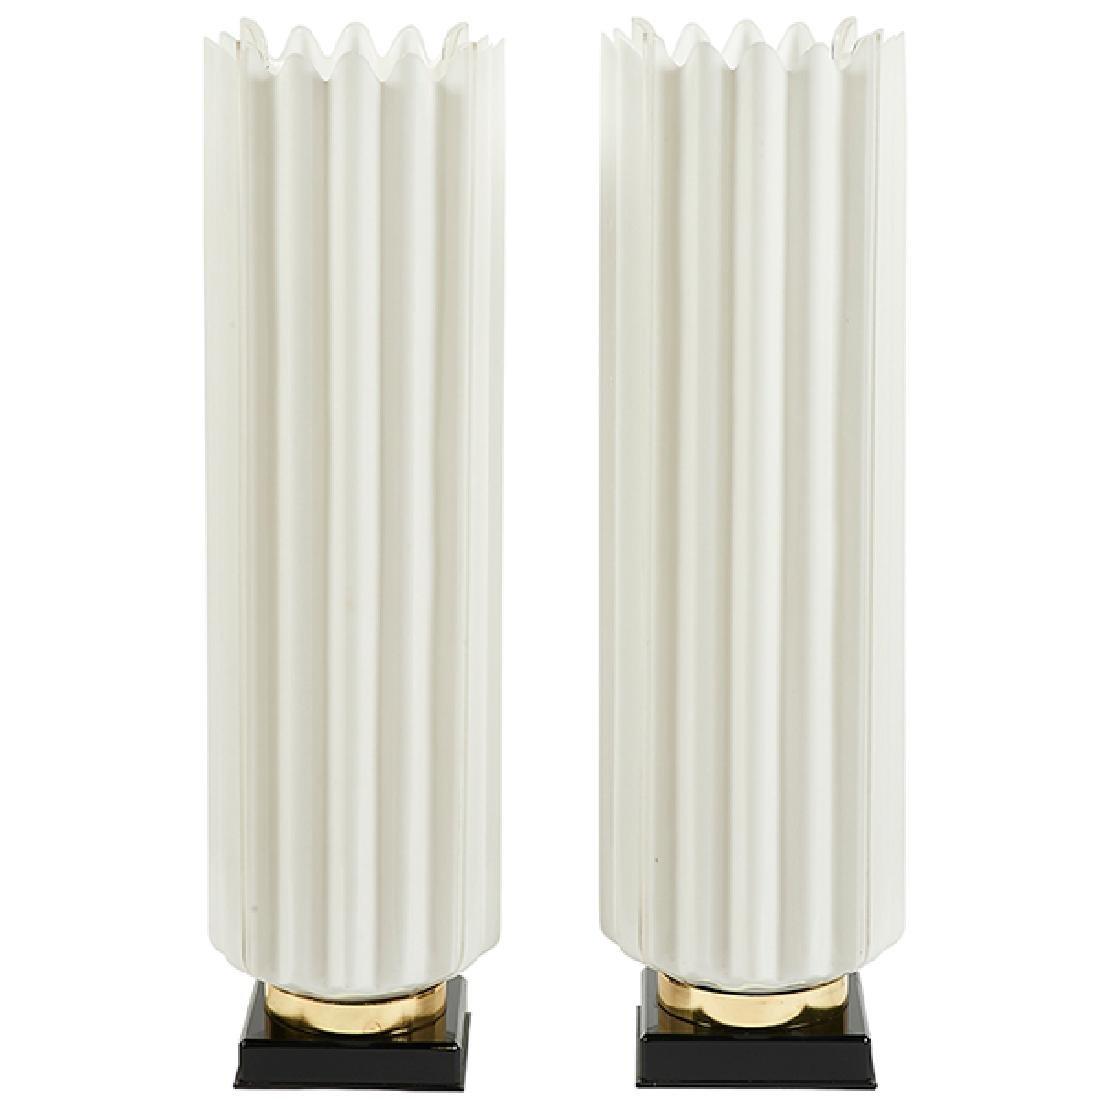 "Rougier table lamps, pair 9.5""dia. x 30.5""h"